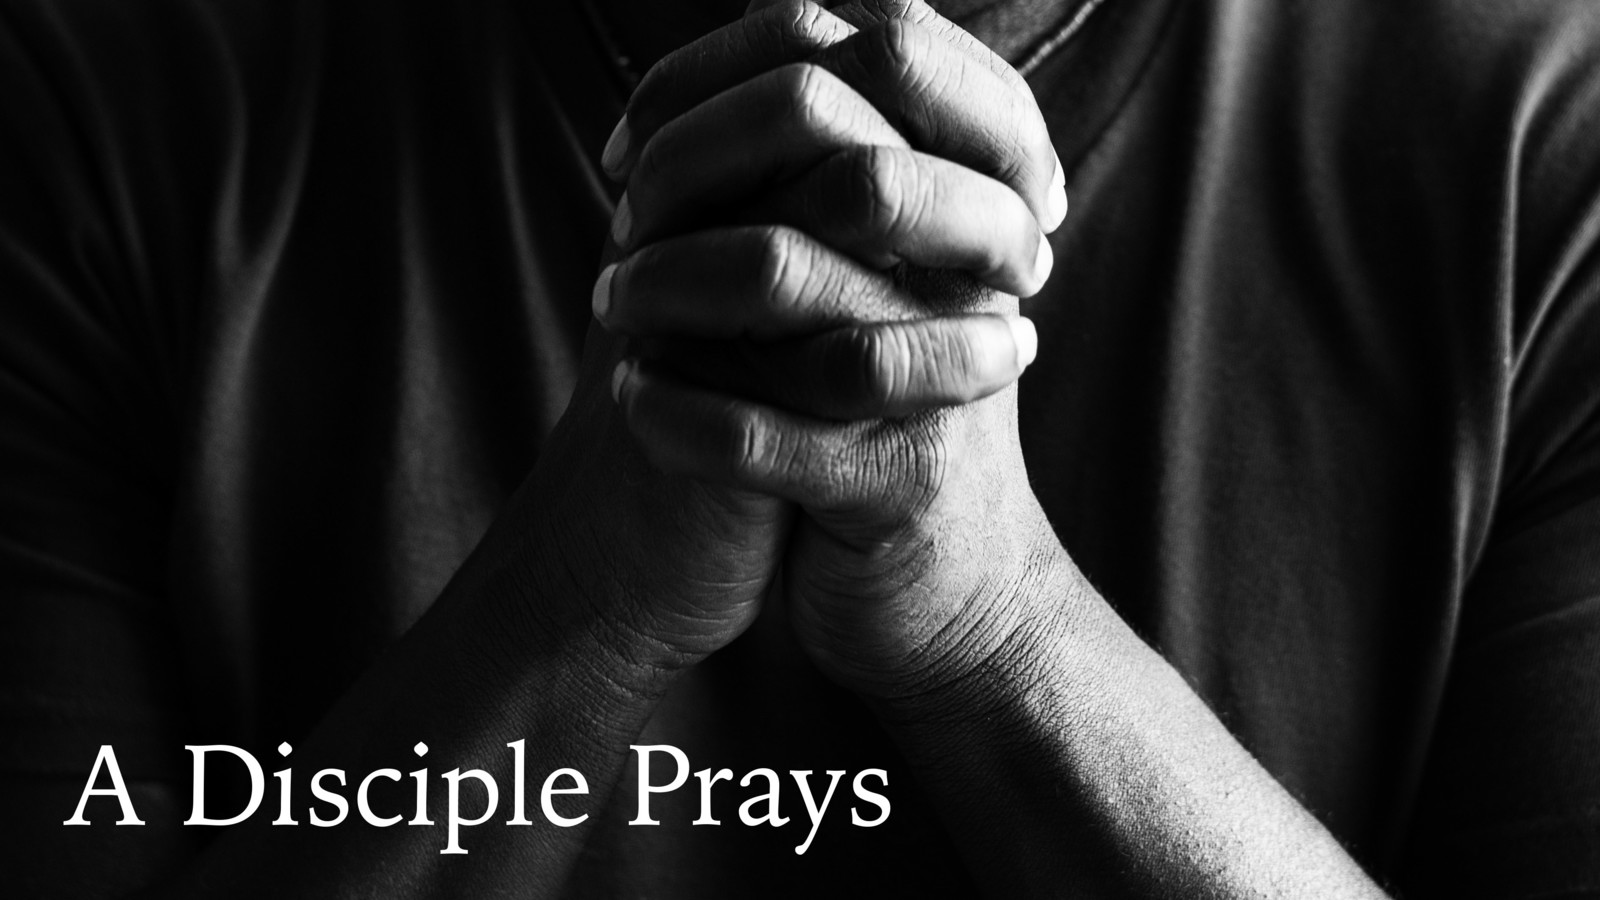 A Disciple Prayers Screen 1